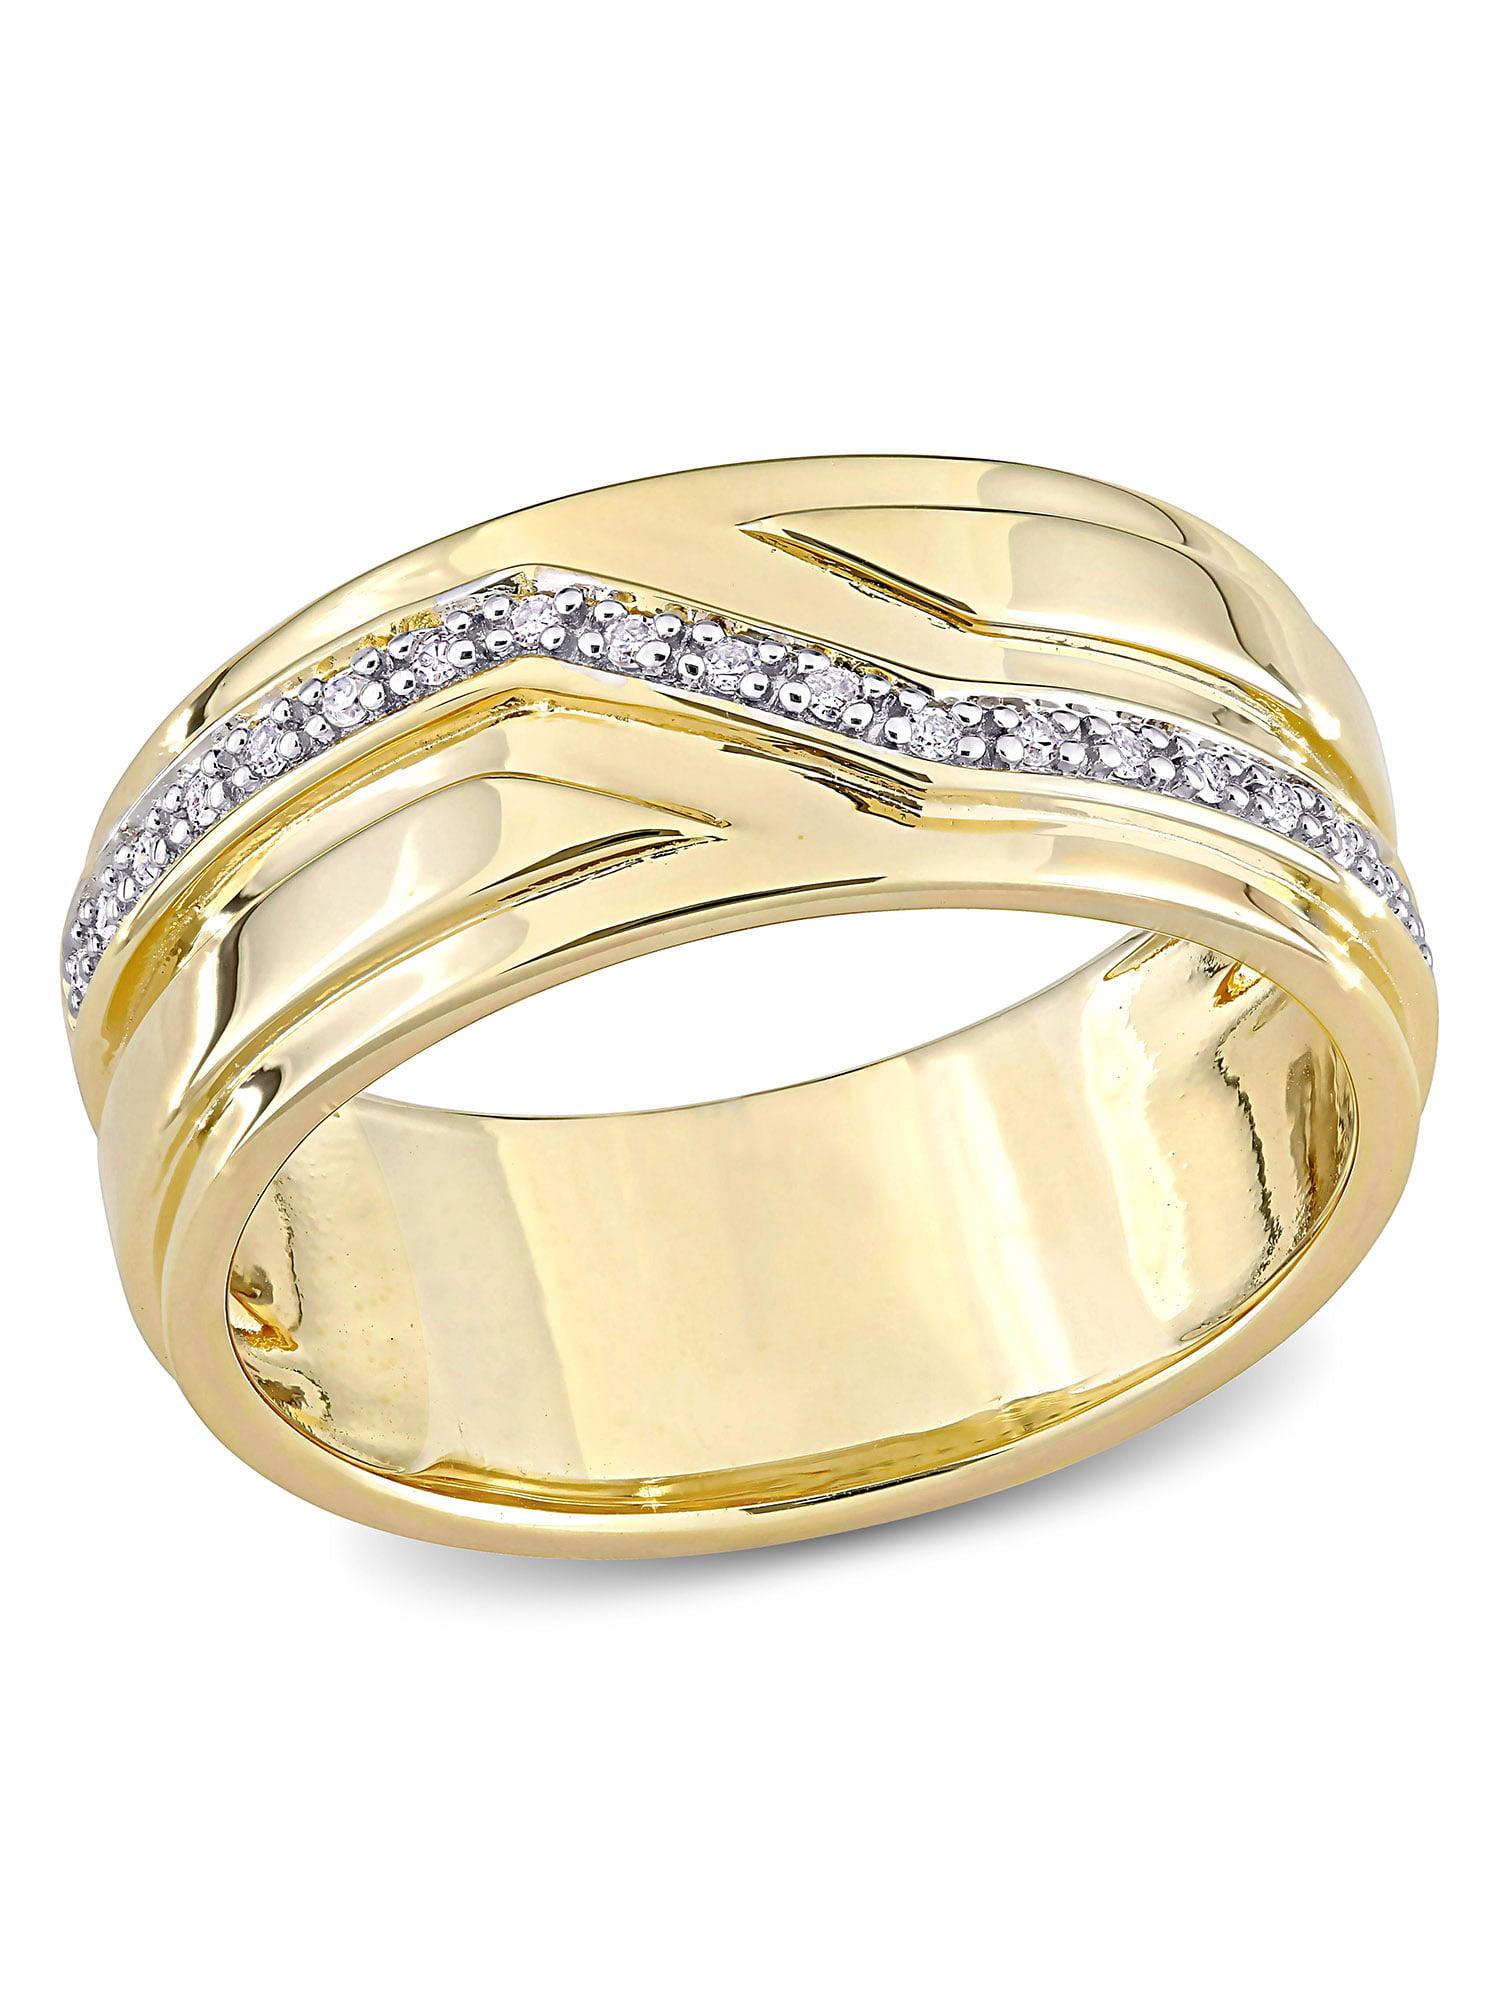 8.5 Mens Stylish 10 Karat Two-Tone Gold Ring